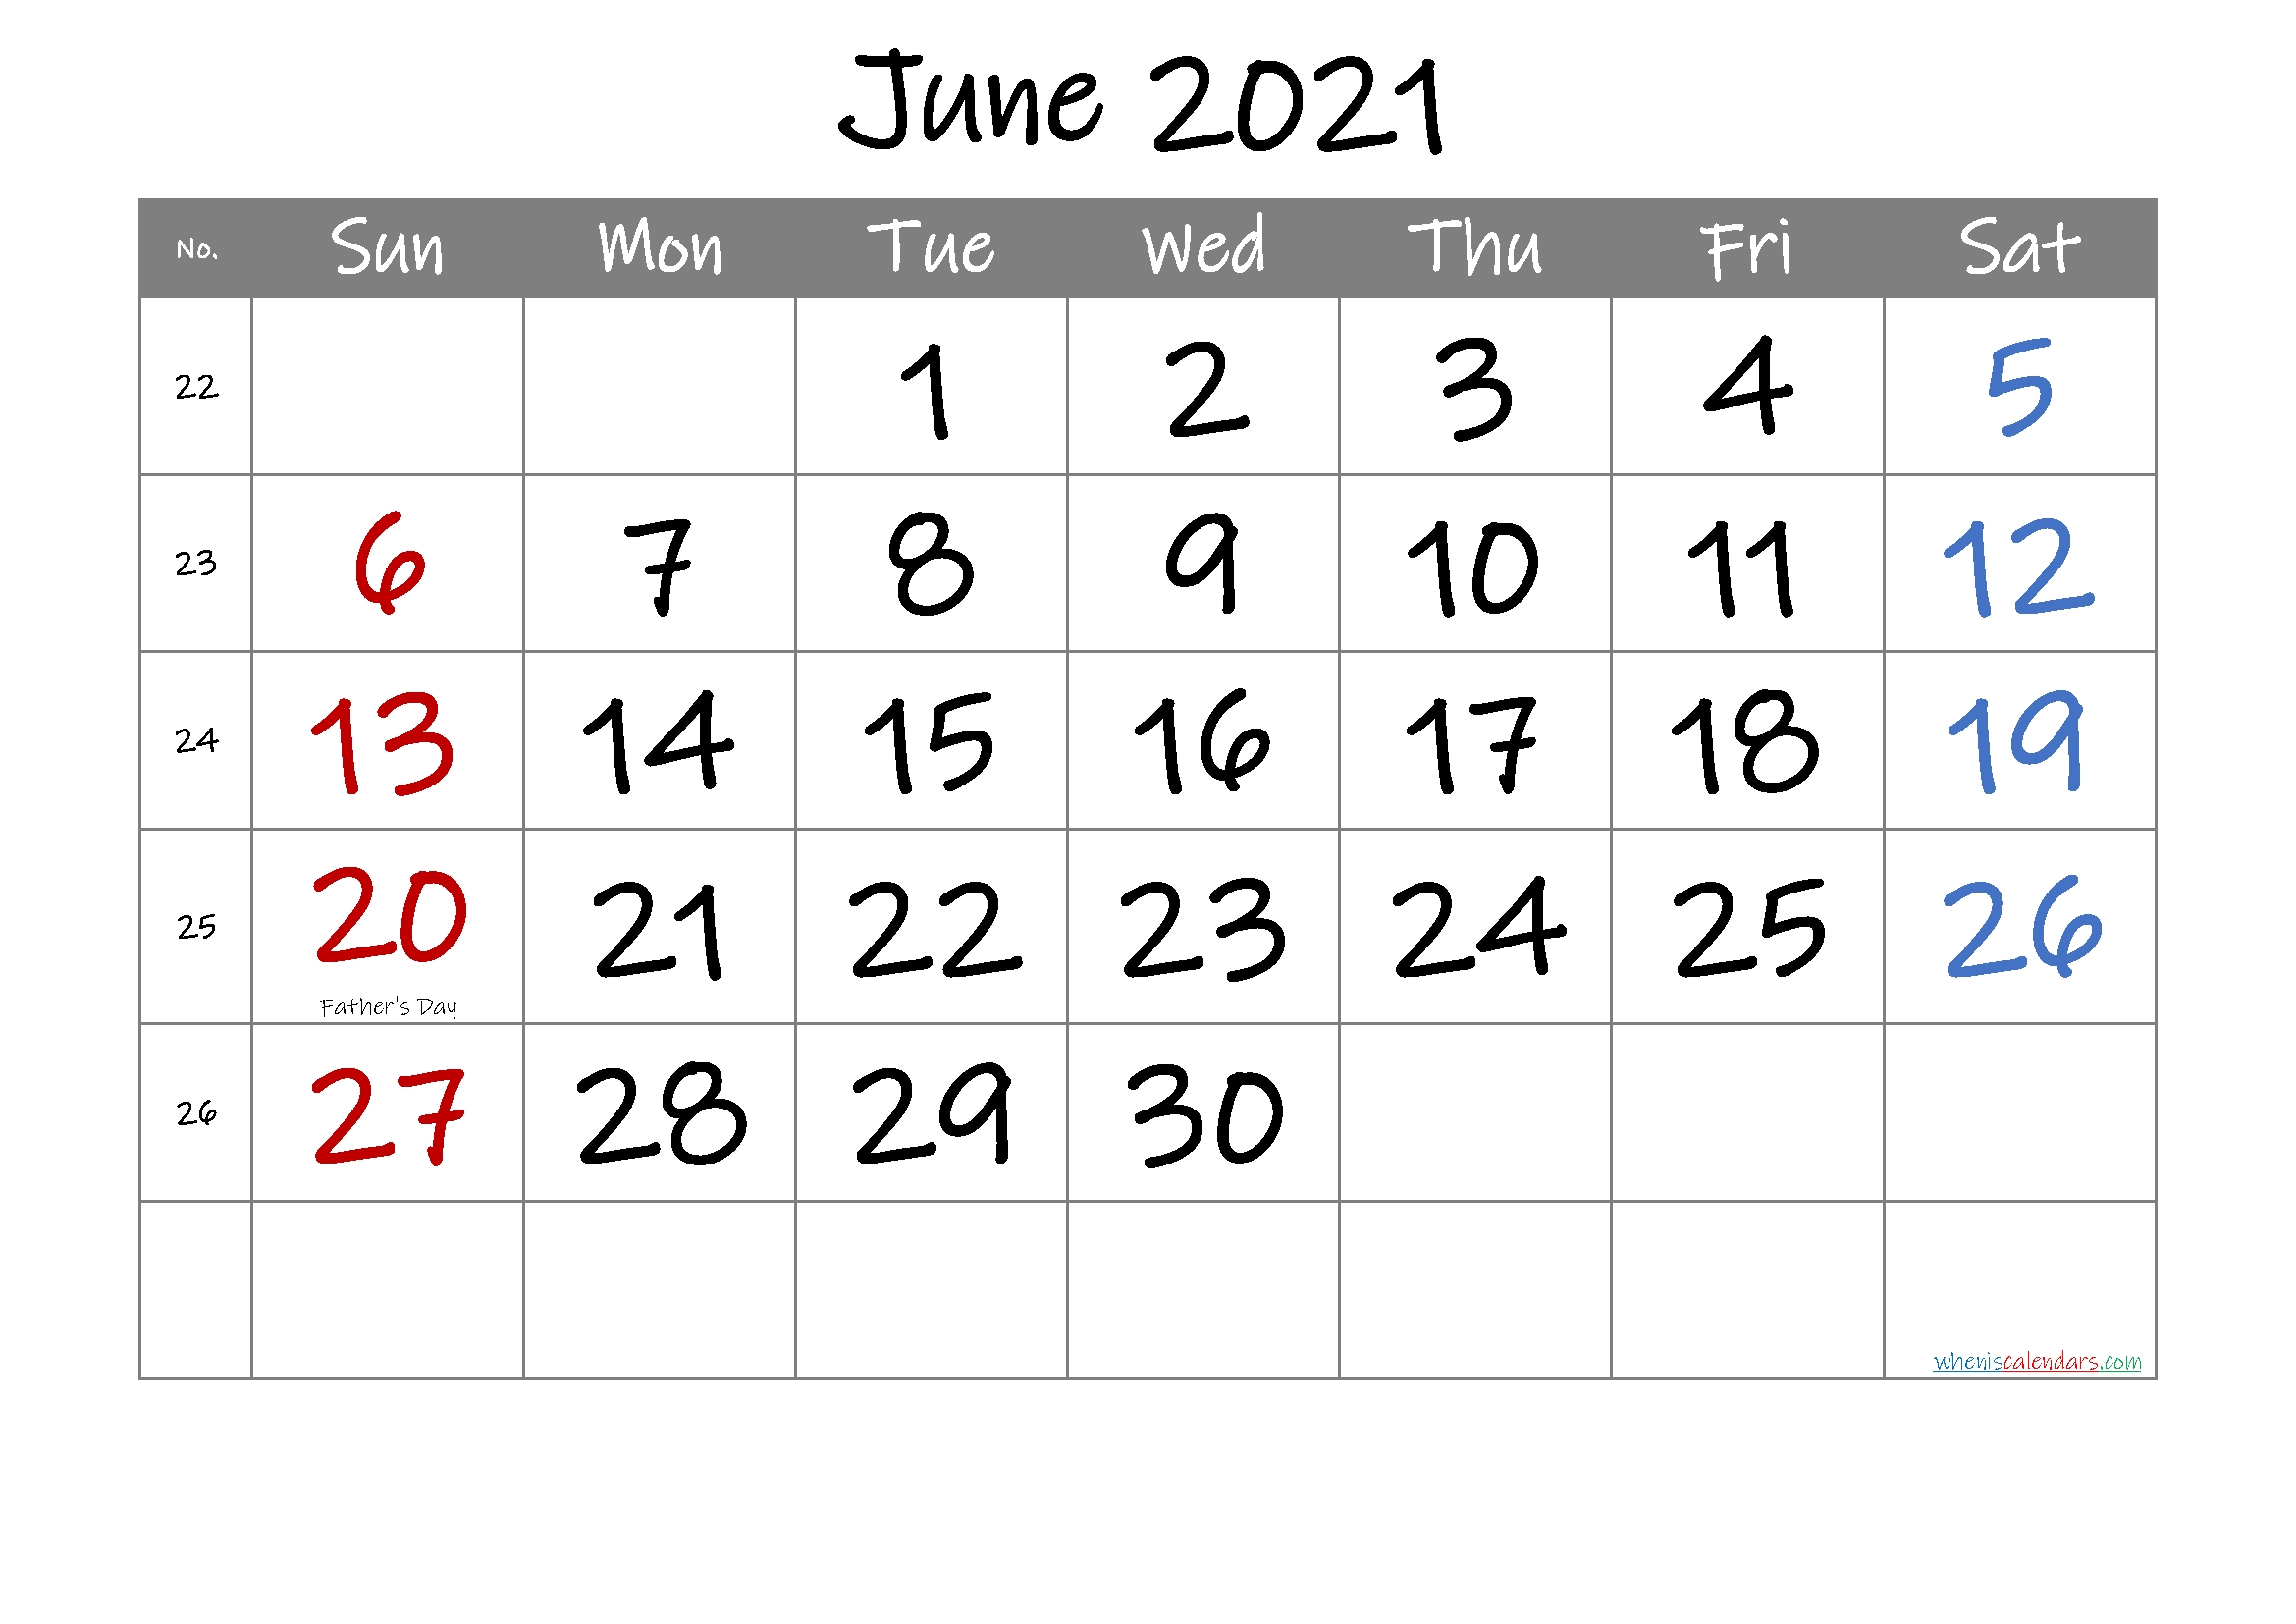 20+ June 2021 Calendar - Free Download Printable Calendar Templates ️ Editable June 2021 Calendar